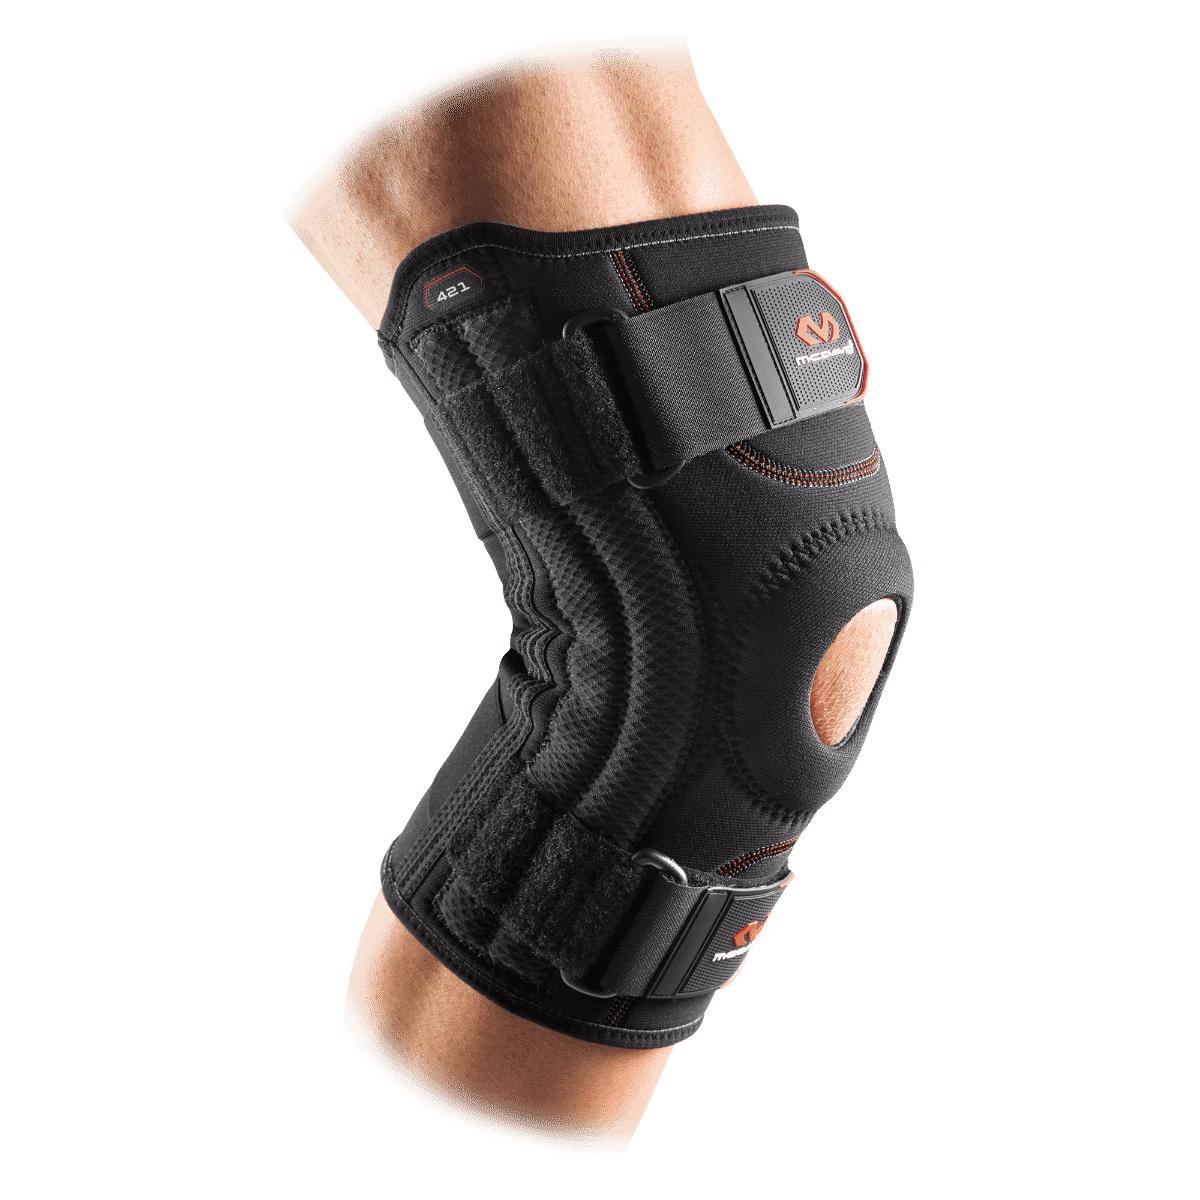 цена на McDavid 421-M Неопреновый бандаж коленного сустава